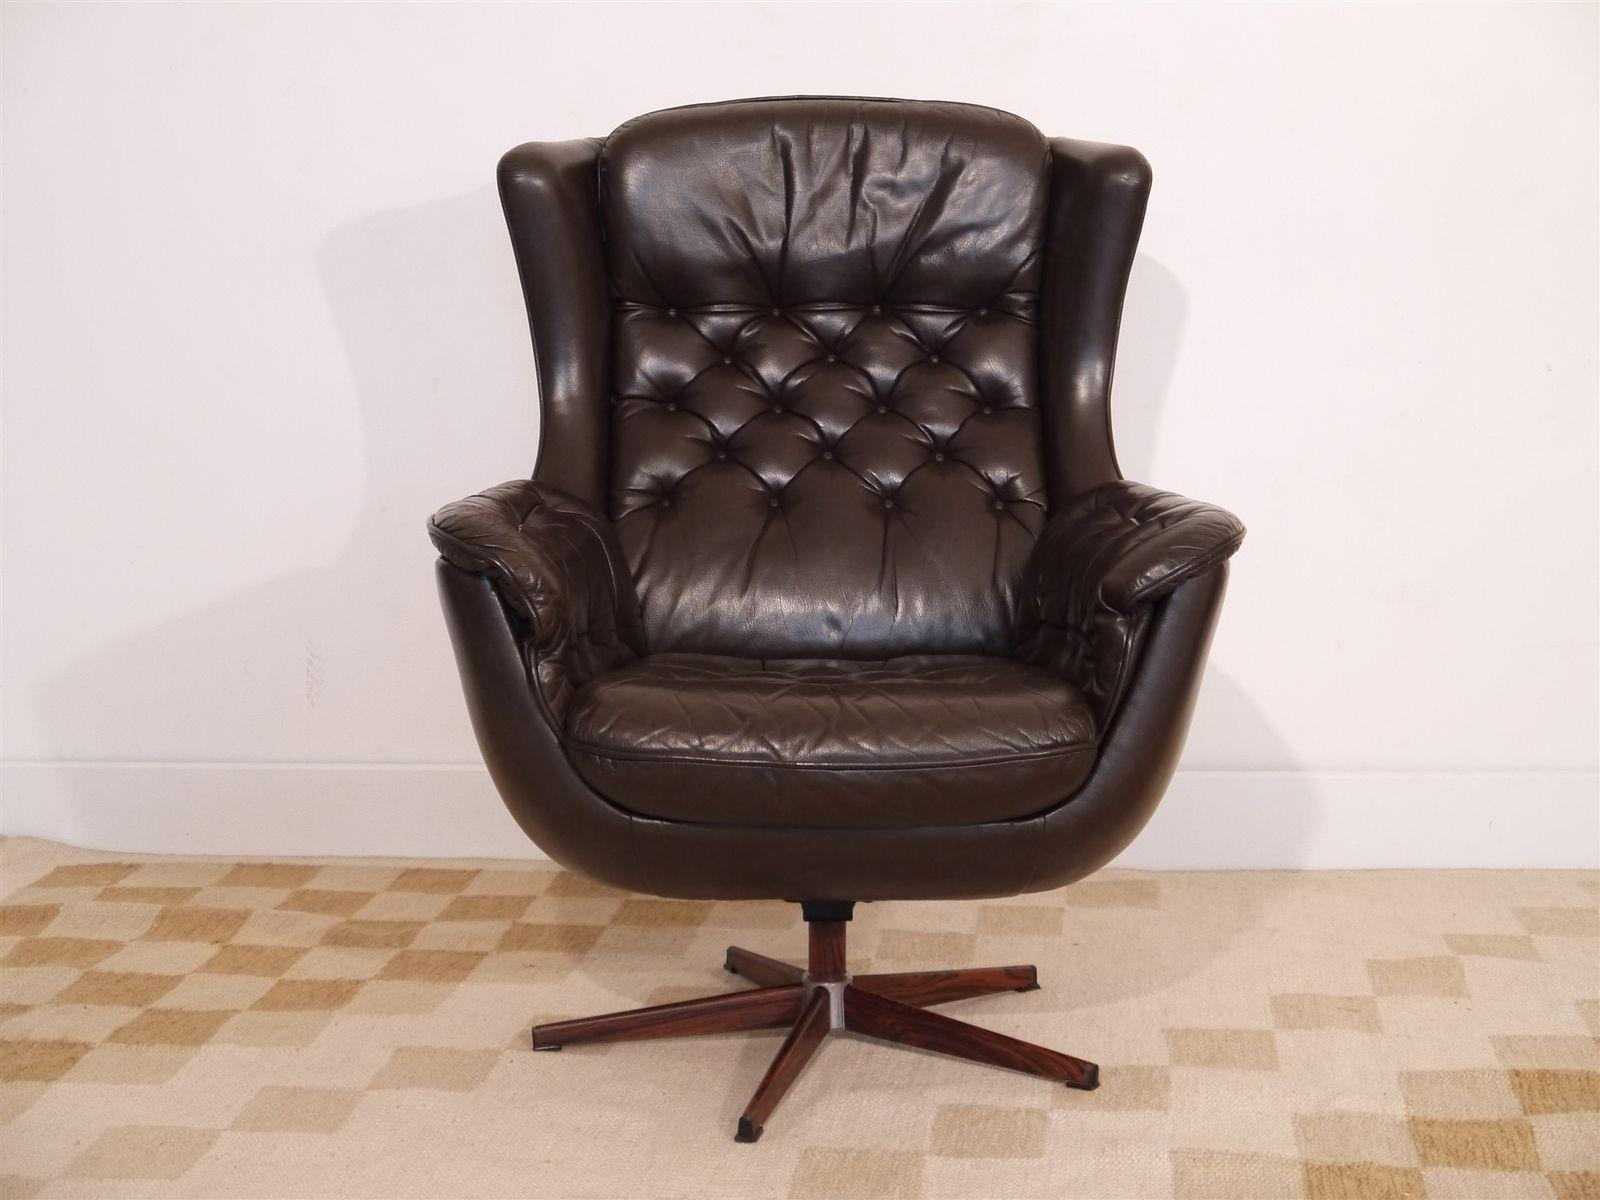 Vintage leather swivel chair - Vintage Danish Leather Swivel Armchair